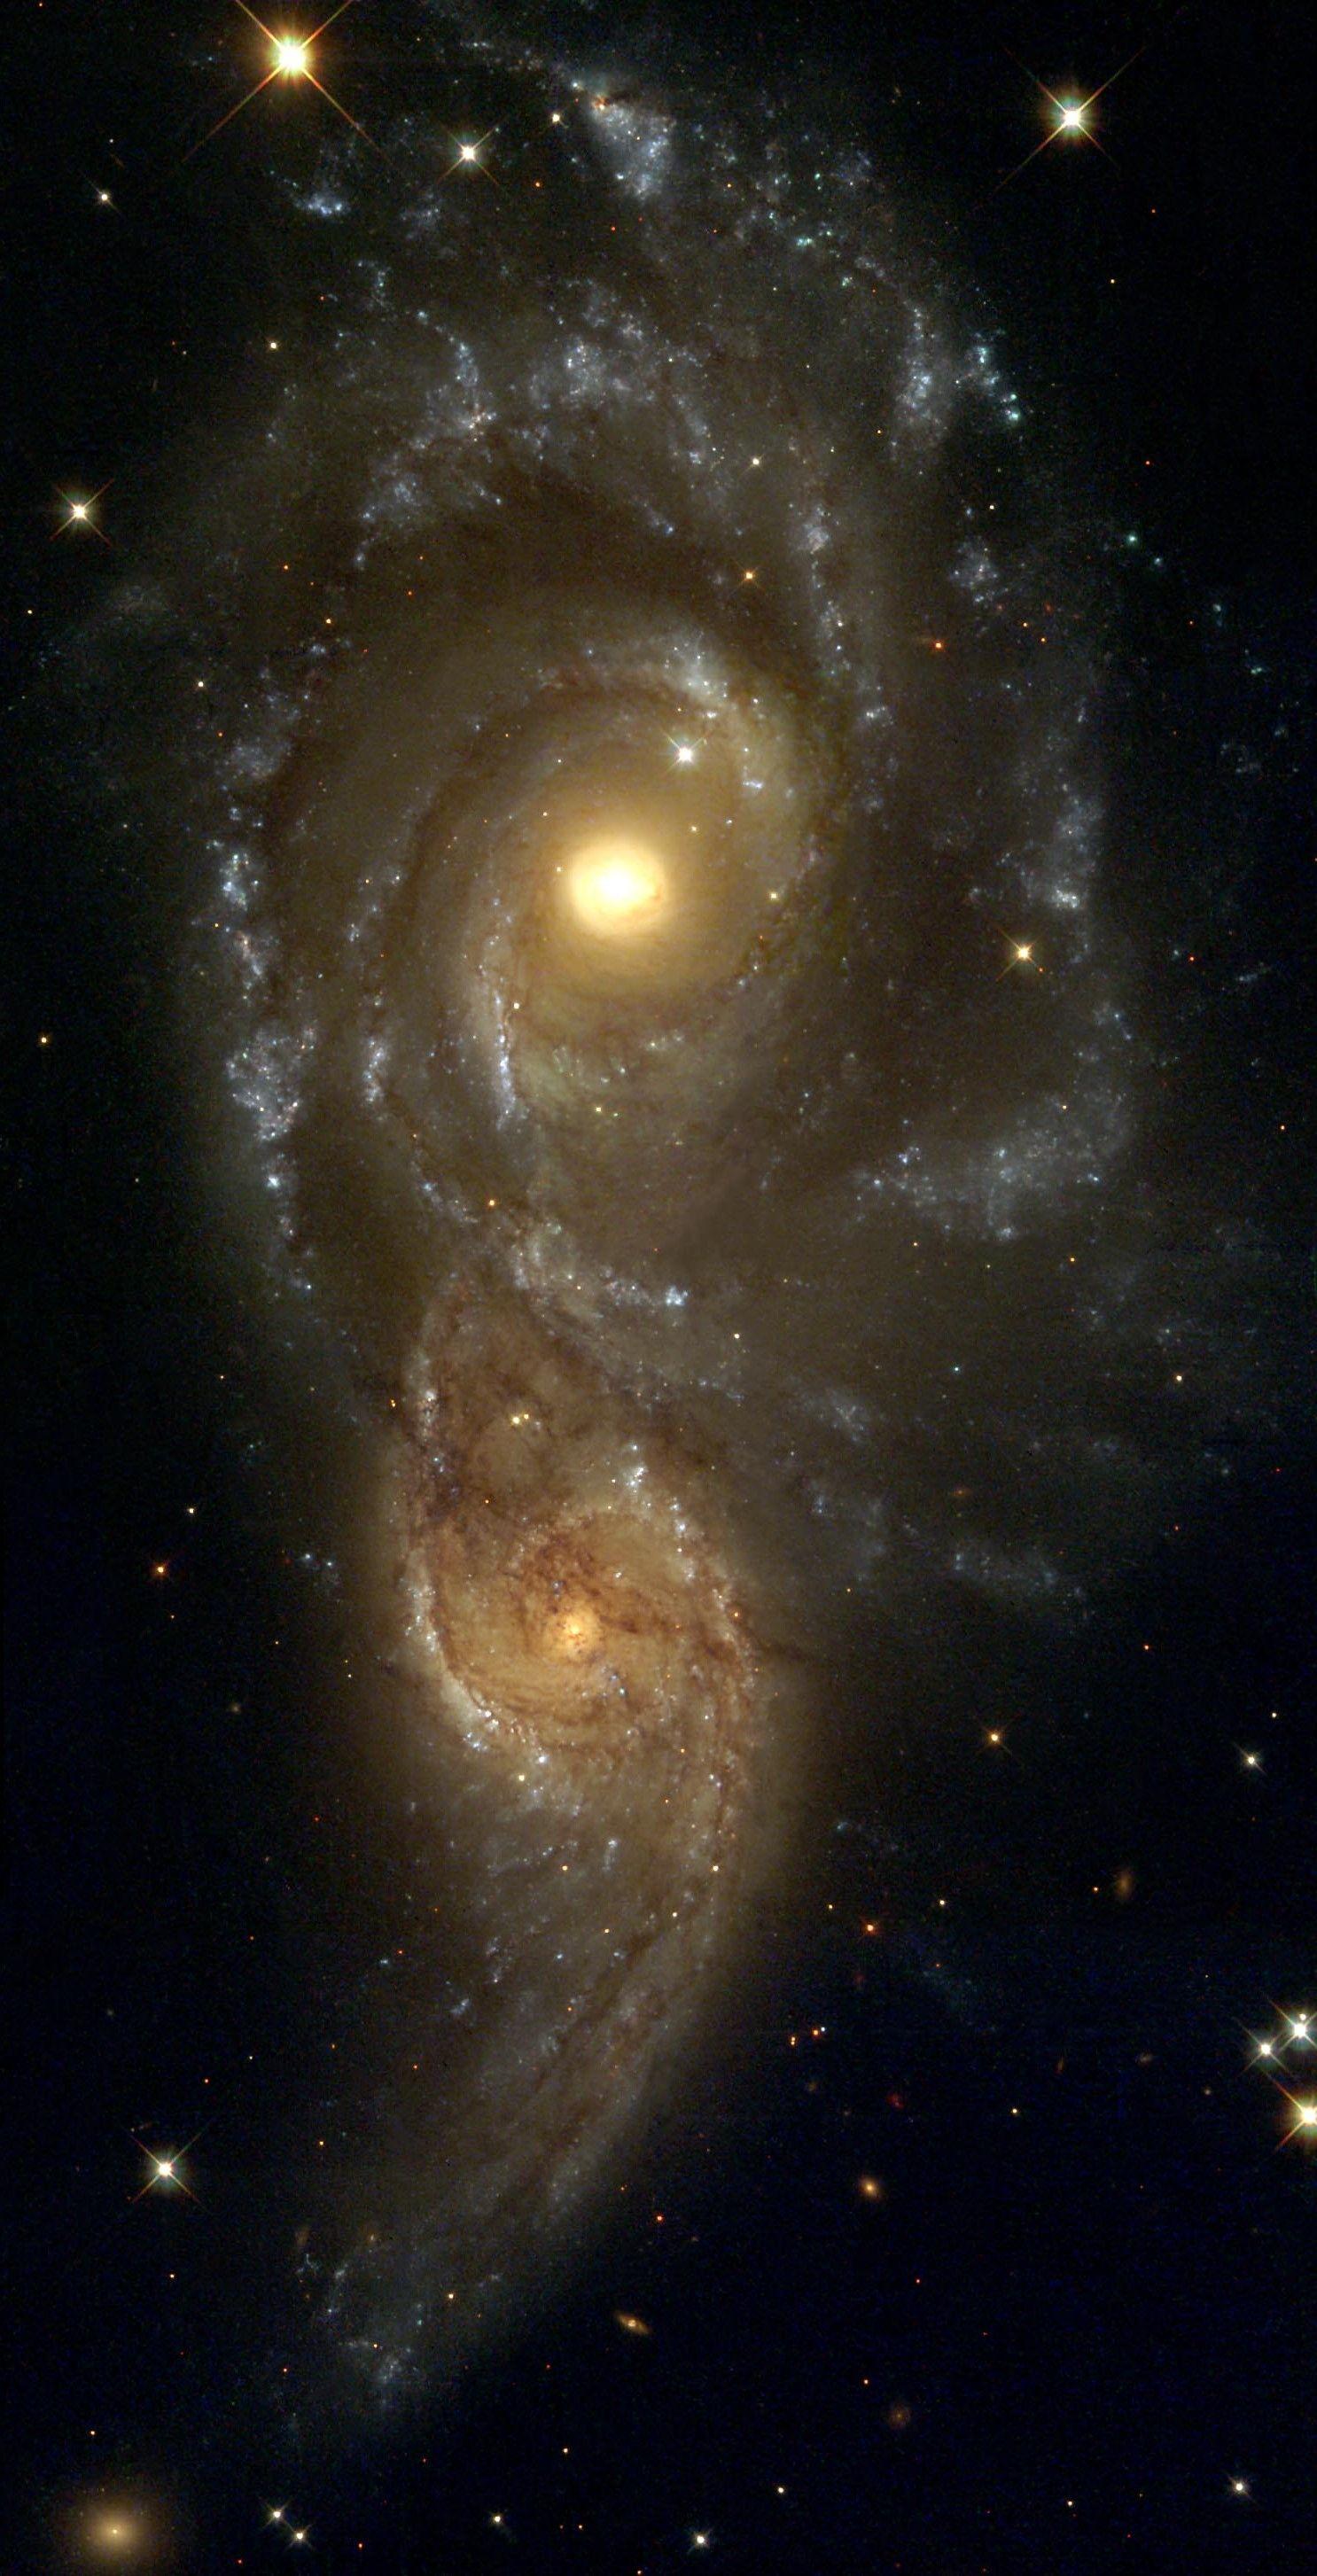 NGC 2207 and IC 2163 by John Herschel  ~ Repinned 4 U by Karen of AZdesertTrips.com